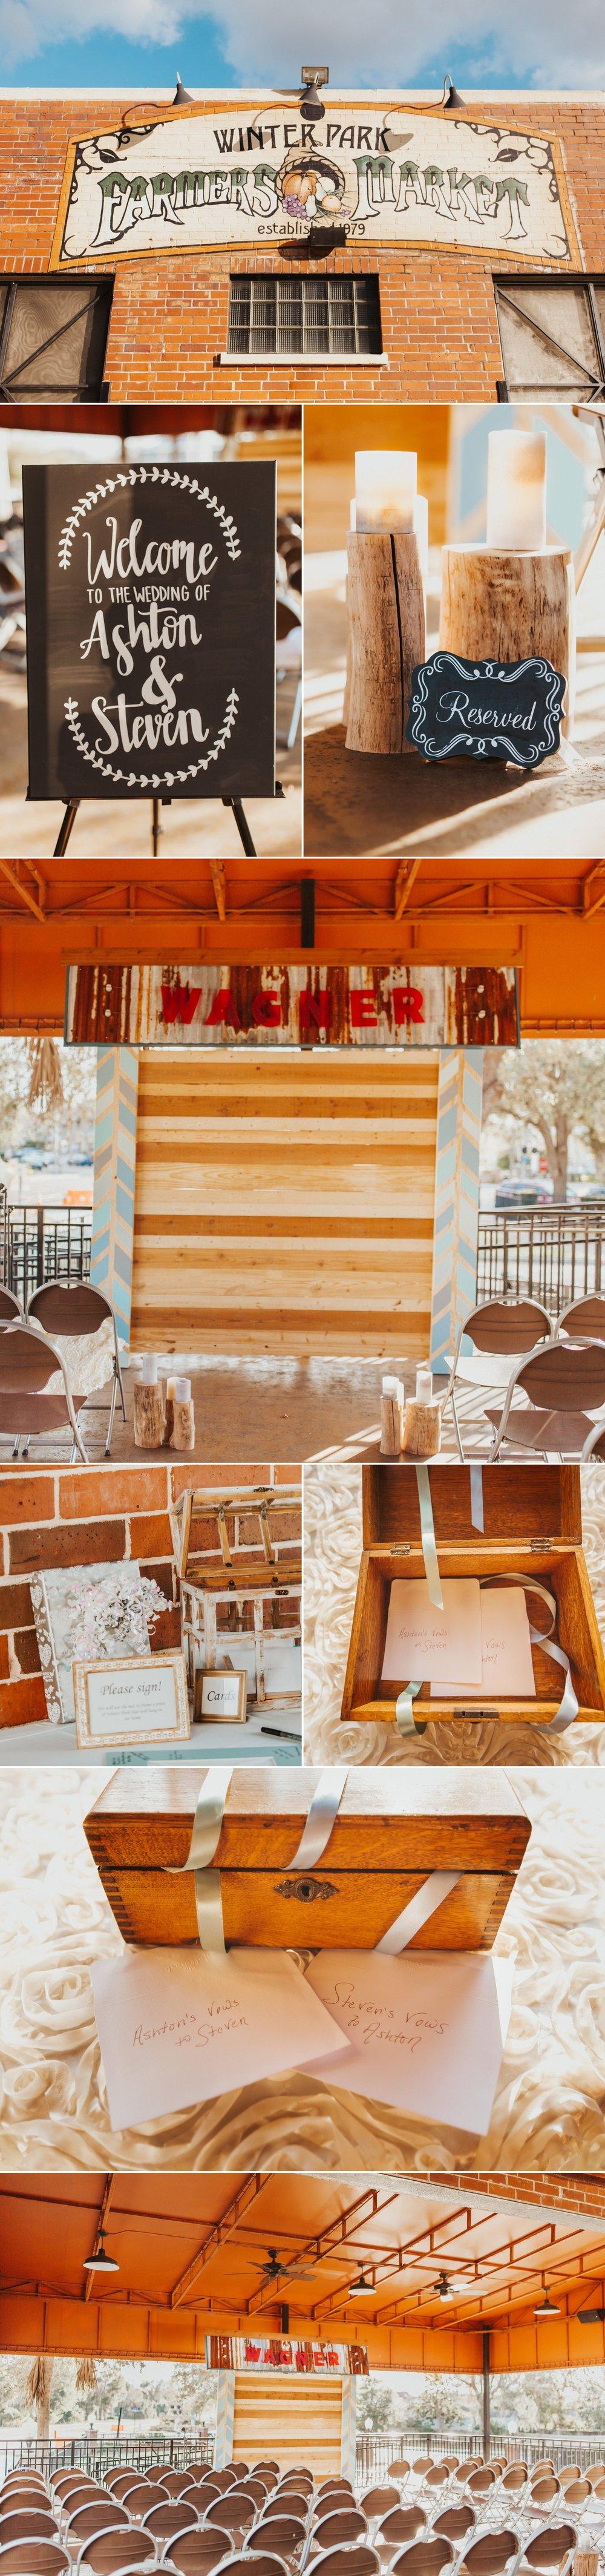 Winter_Park_Farmers_Market_Wedding_Photography_French_Rustic_Inspired_ShainaDeCiryan.com10.jpg